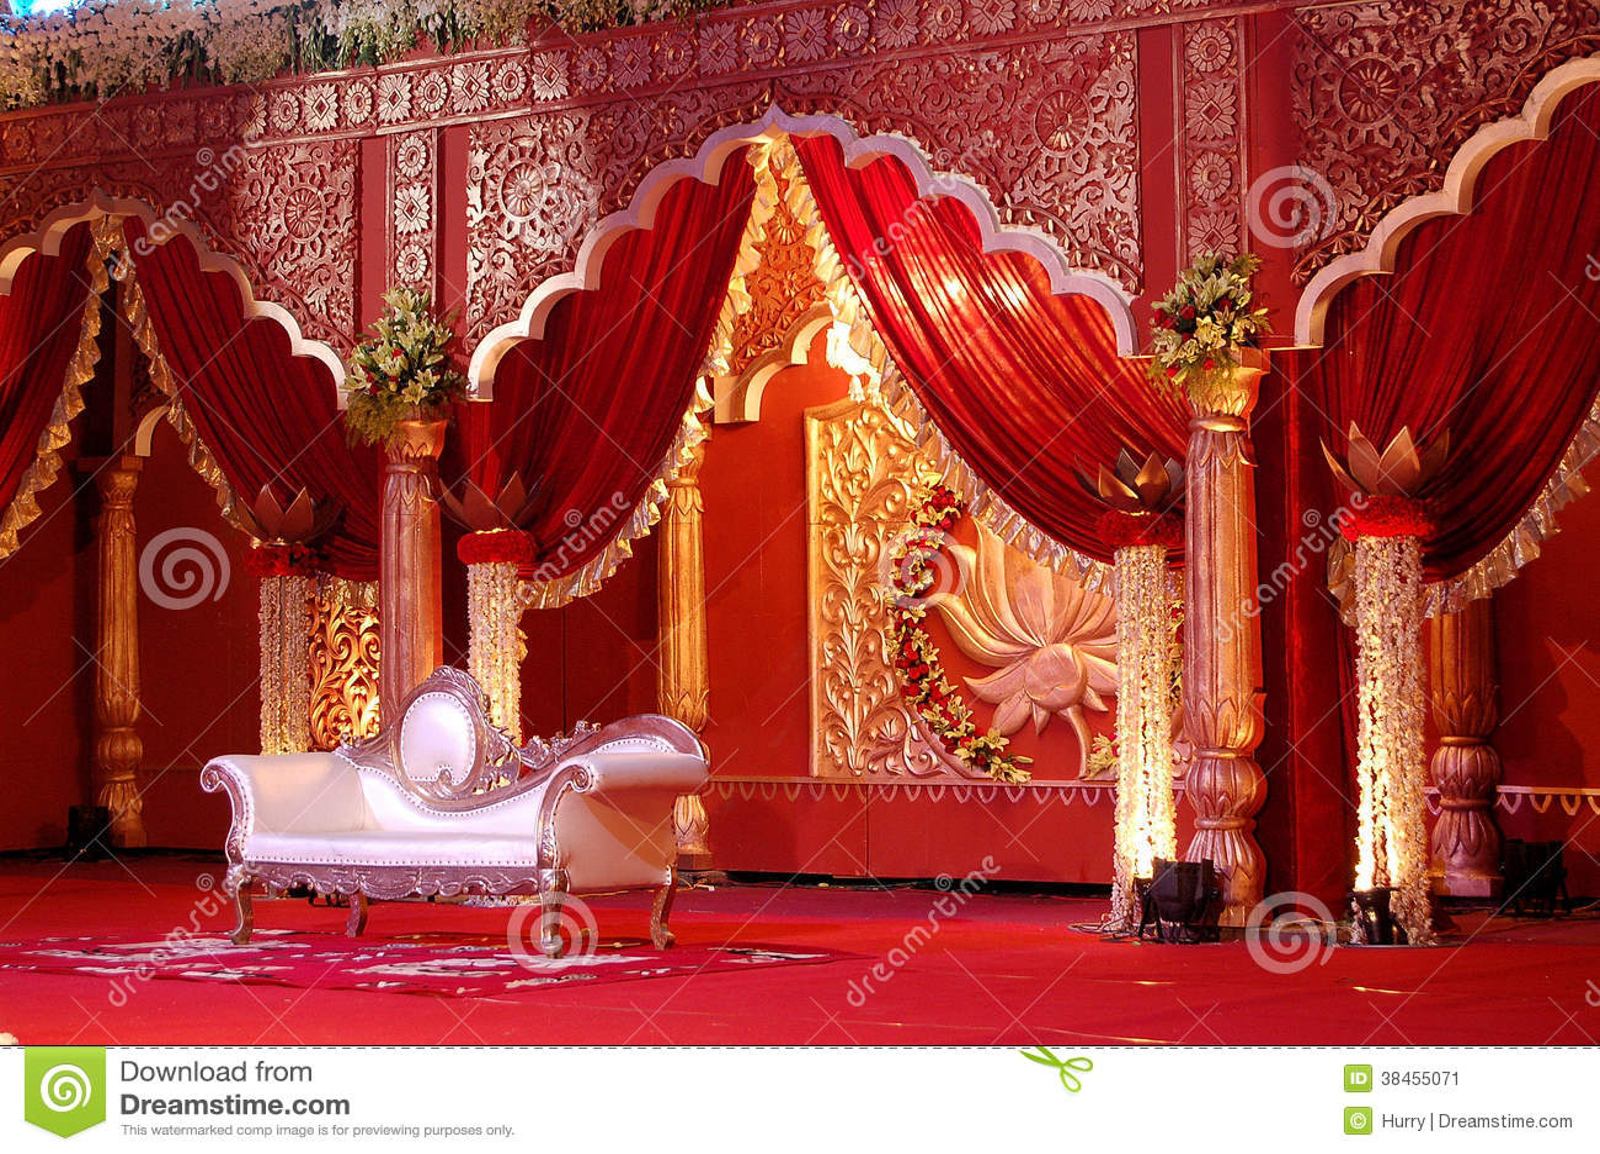 Indian Wedding Stage Mandap Royalty Free Stock Image